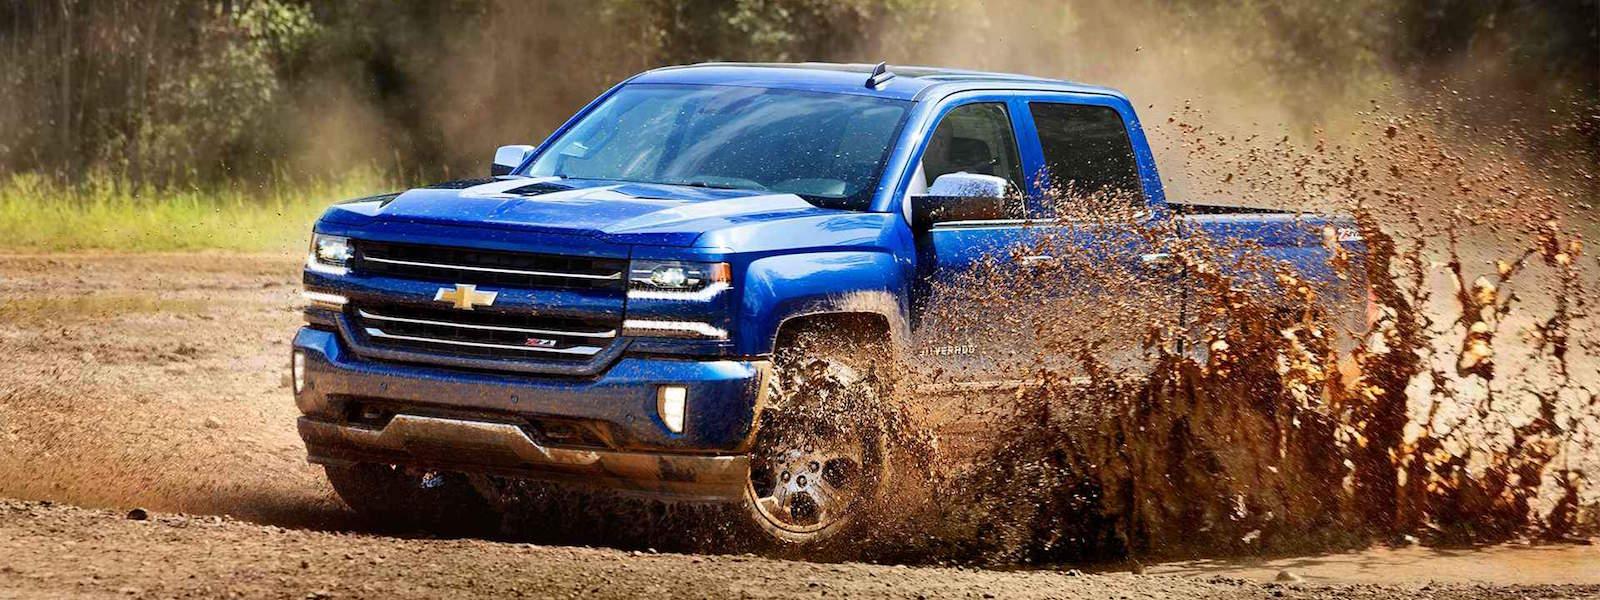 A blue Chevy Silverado is driving through a mud puddle near Cincinnati, OH.